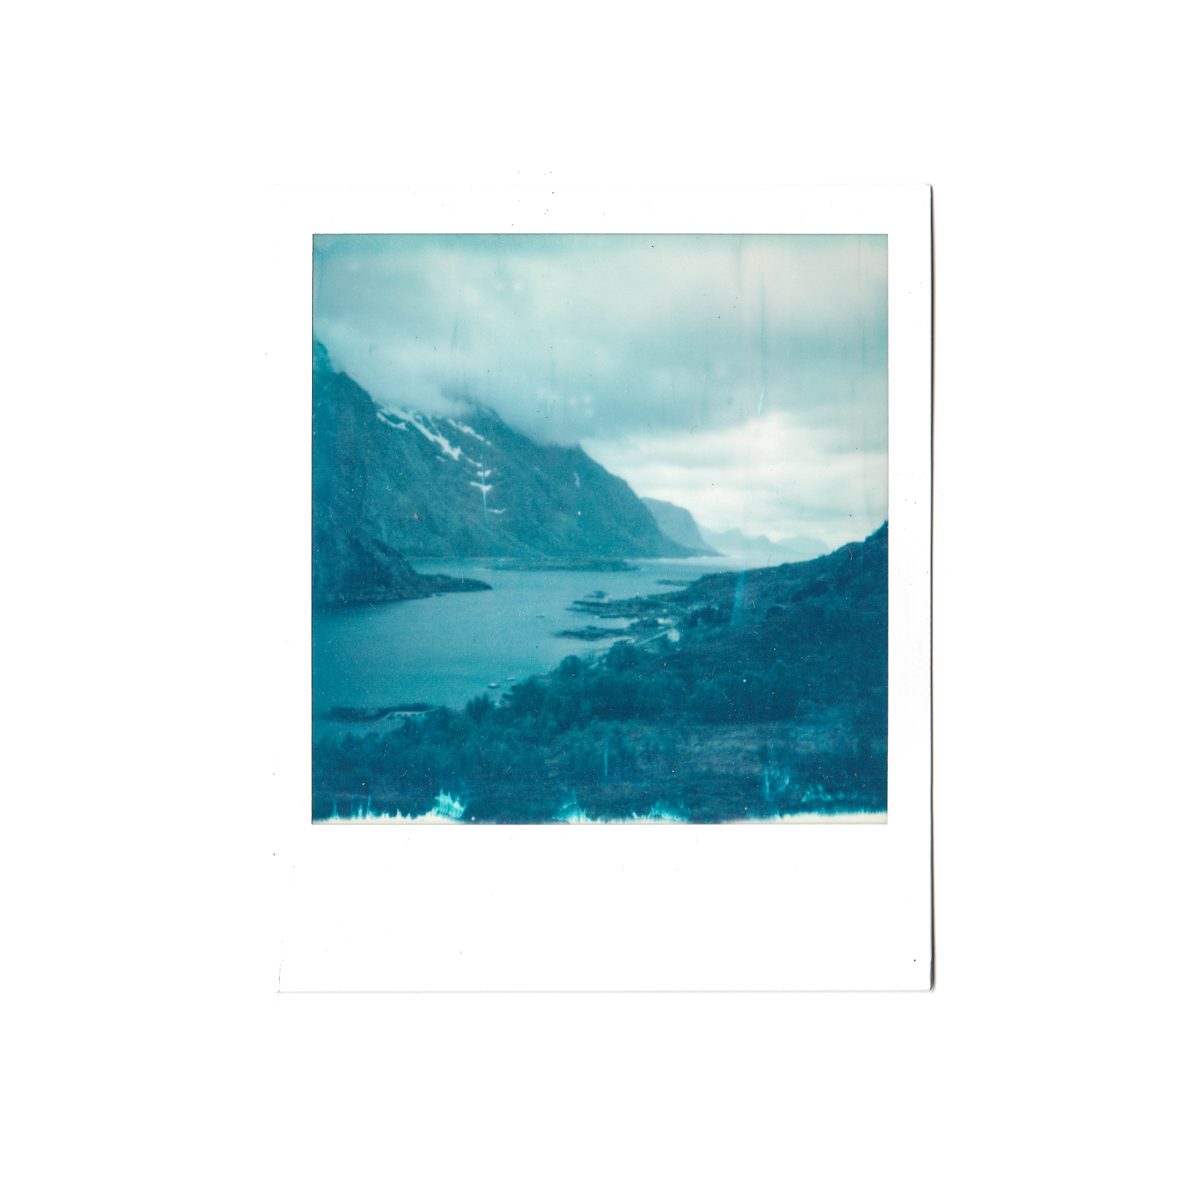 Magnolia_mountain_solvor_MT34-14.jpg